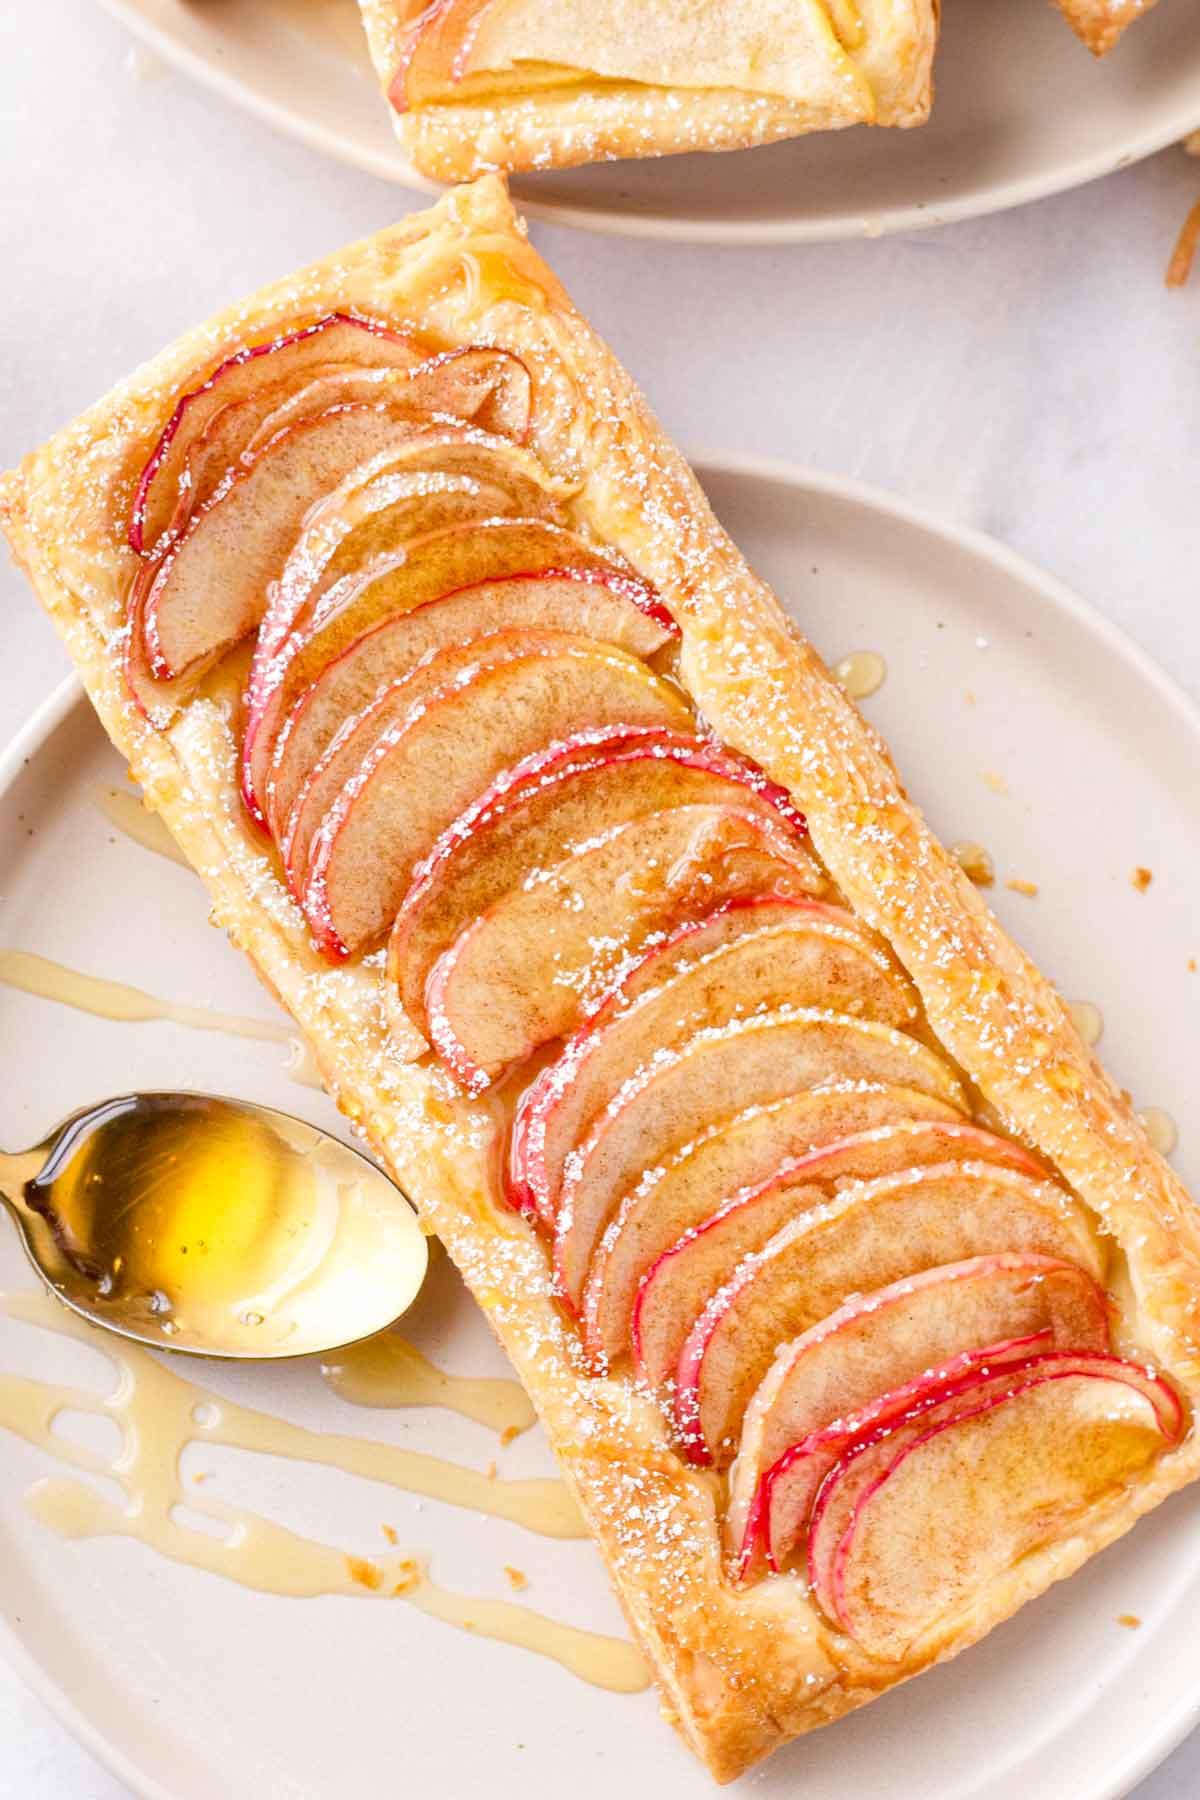 fruit flaky tarts next to a spoon with honey